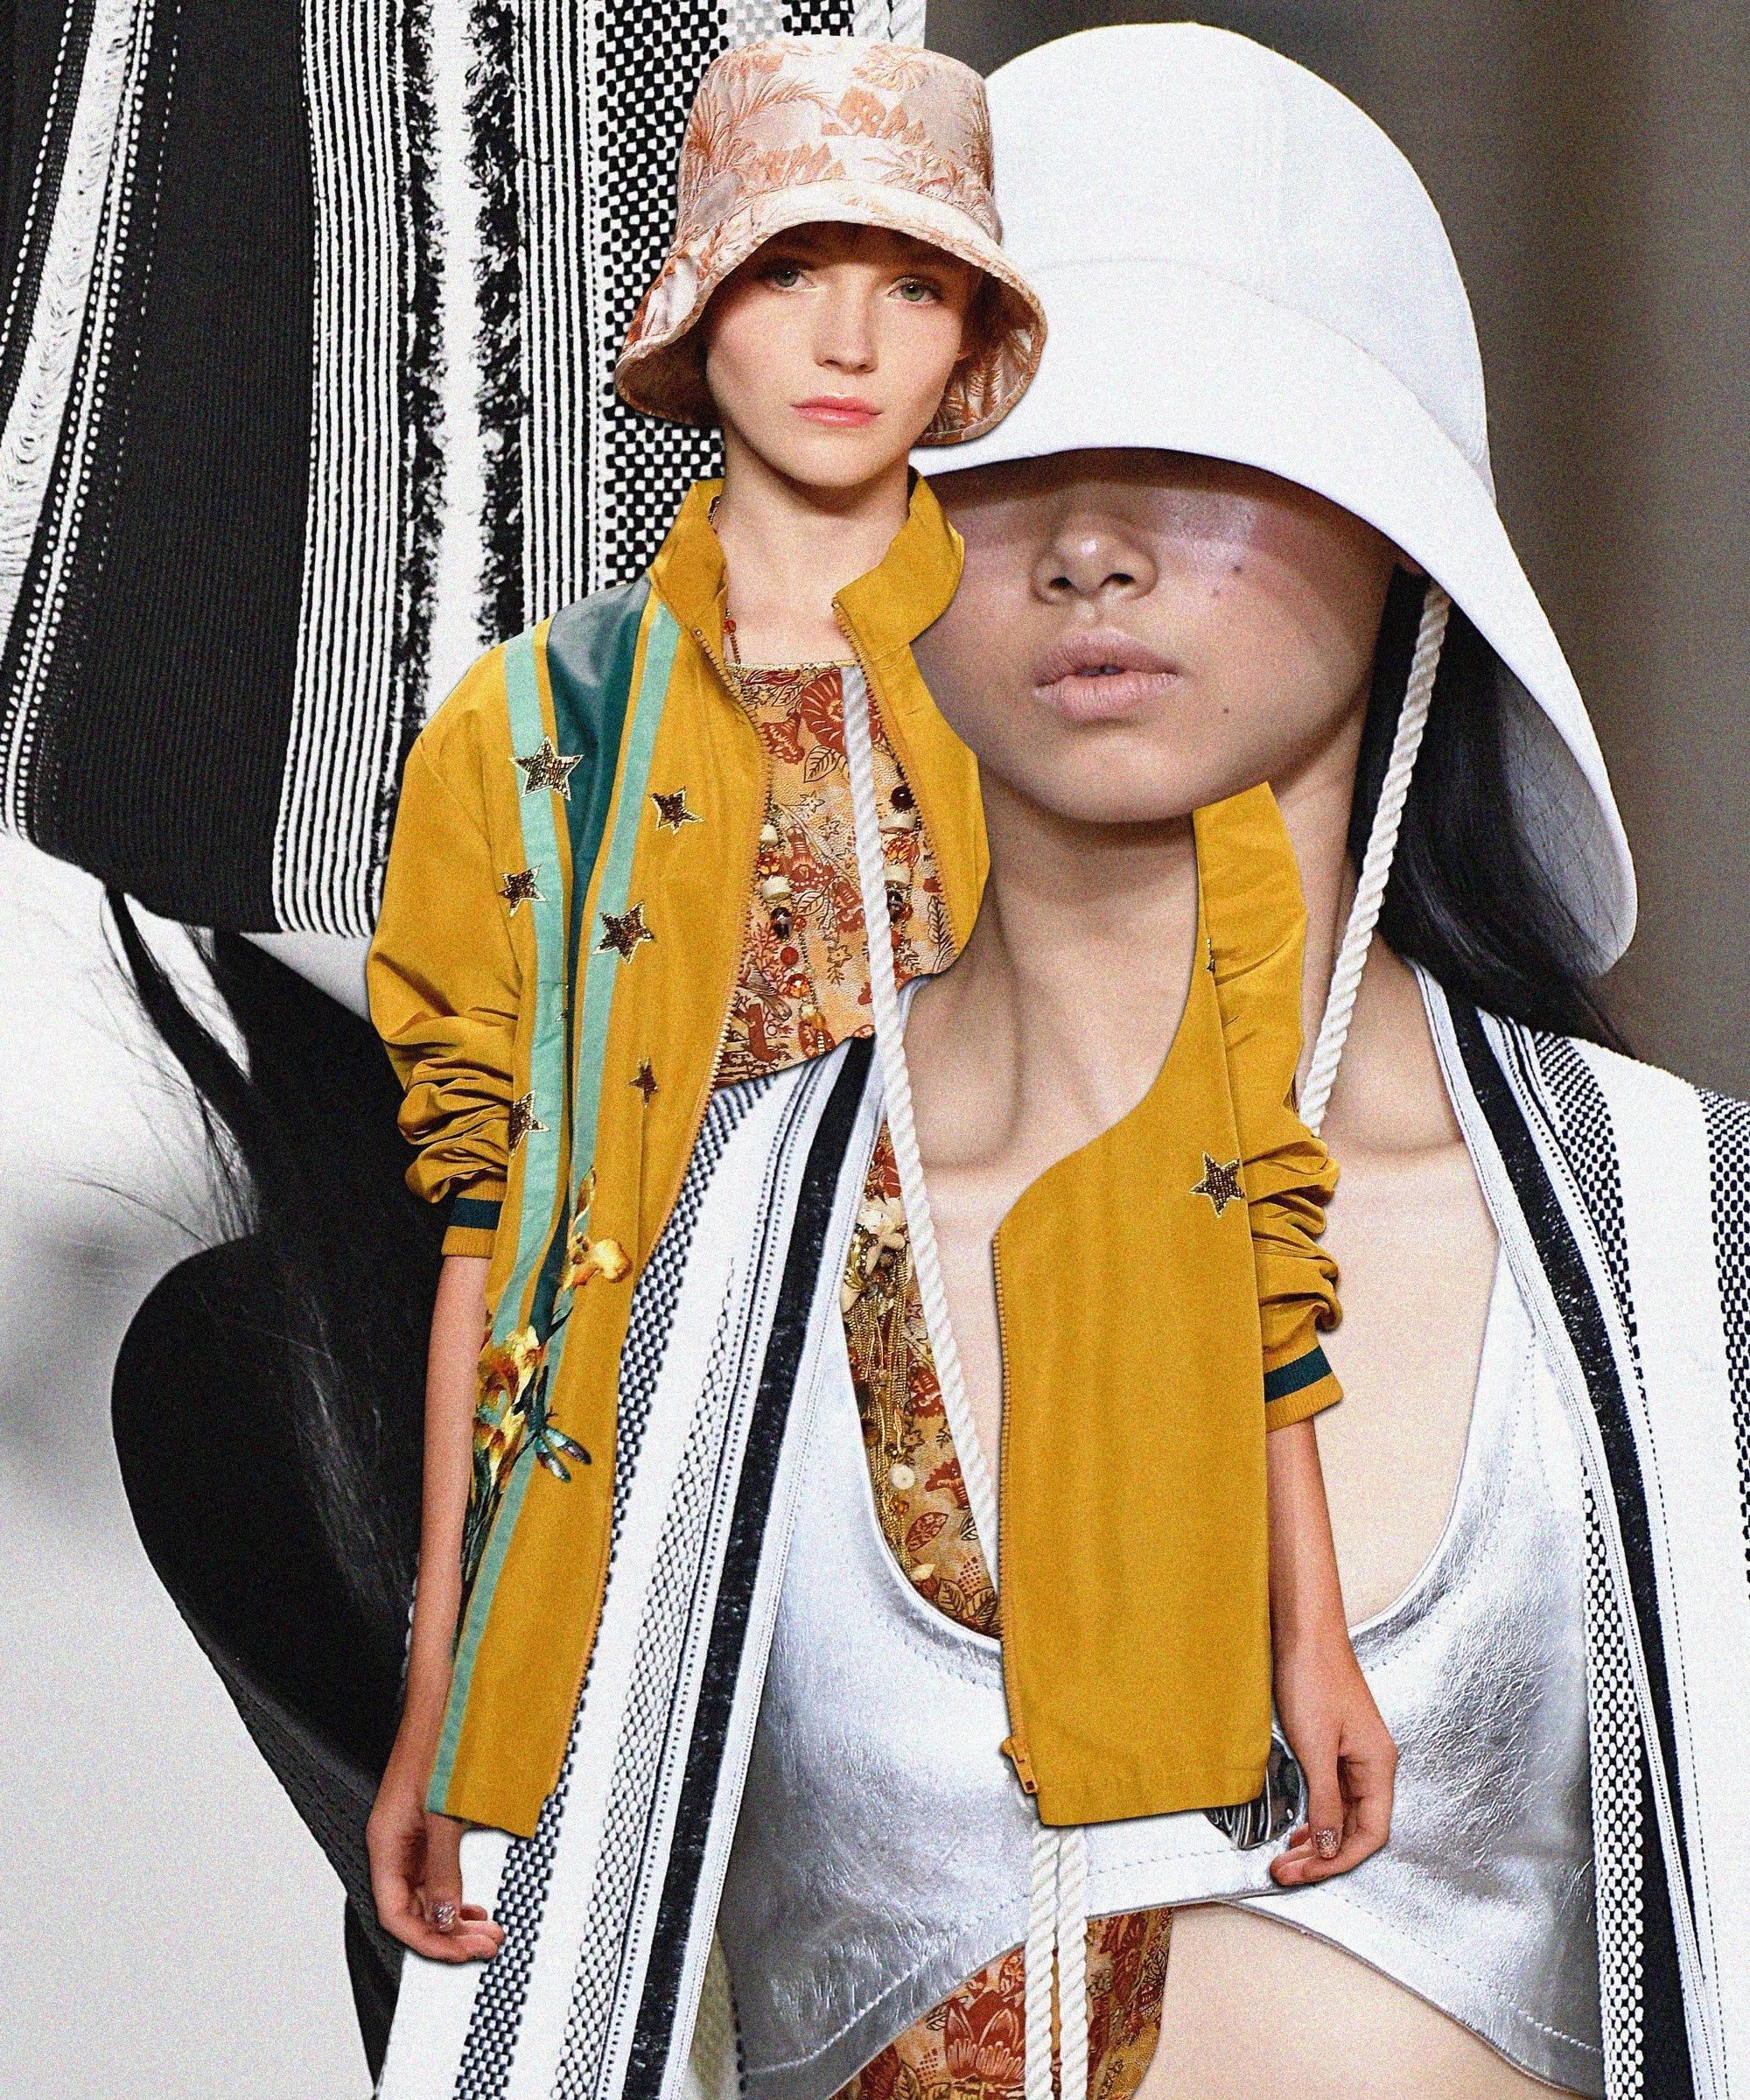 29 2019 La Grandes Pour Inspirations Venues De Mode WEH29DI